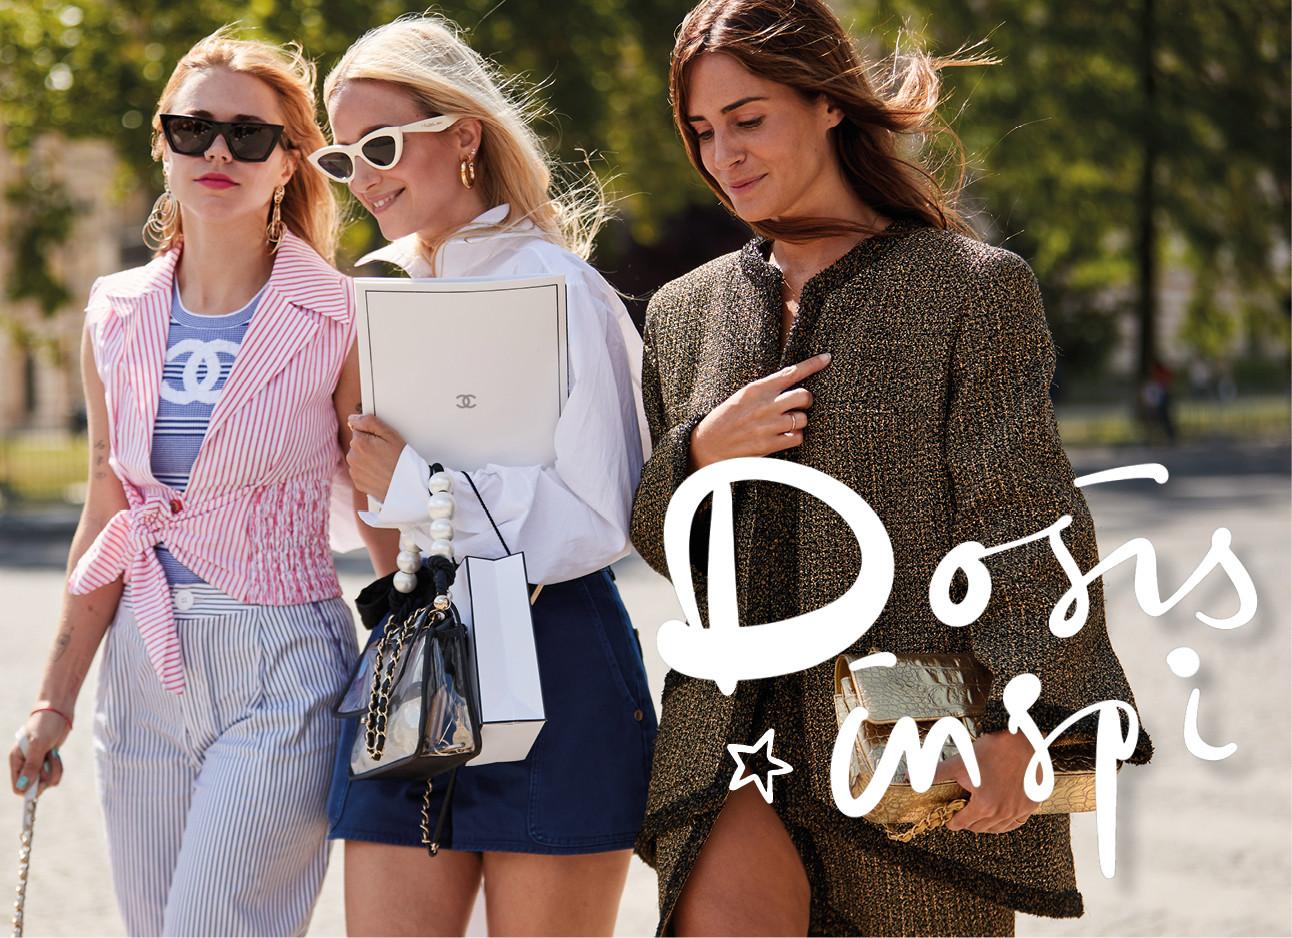 3 meiden in Parijs fashionable gekleed